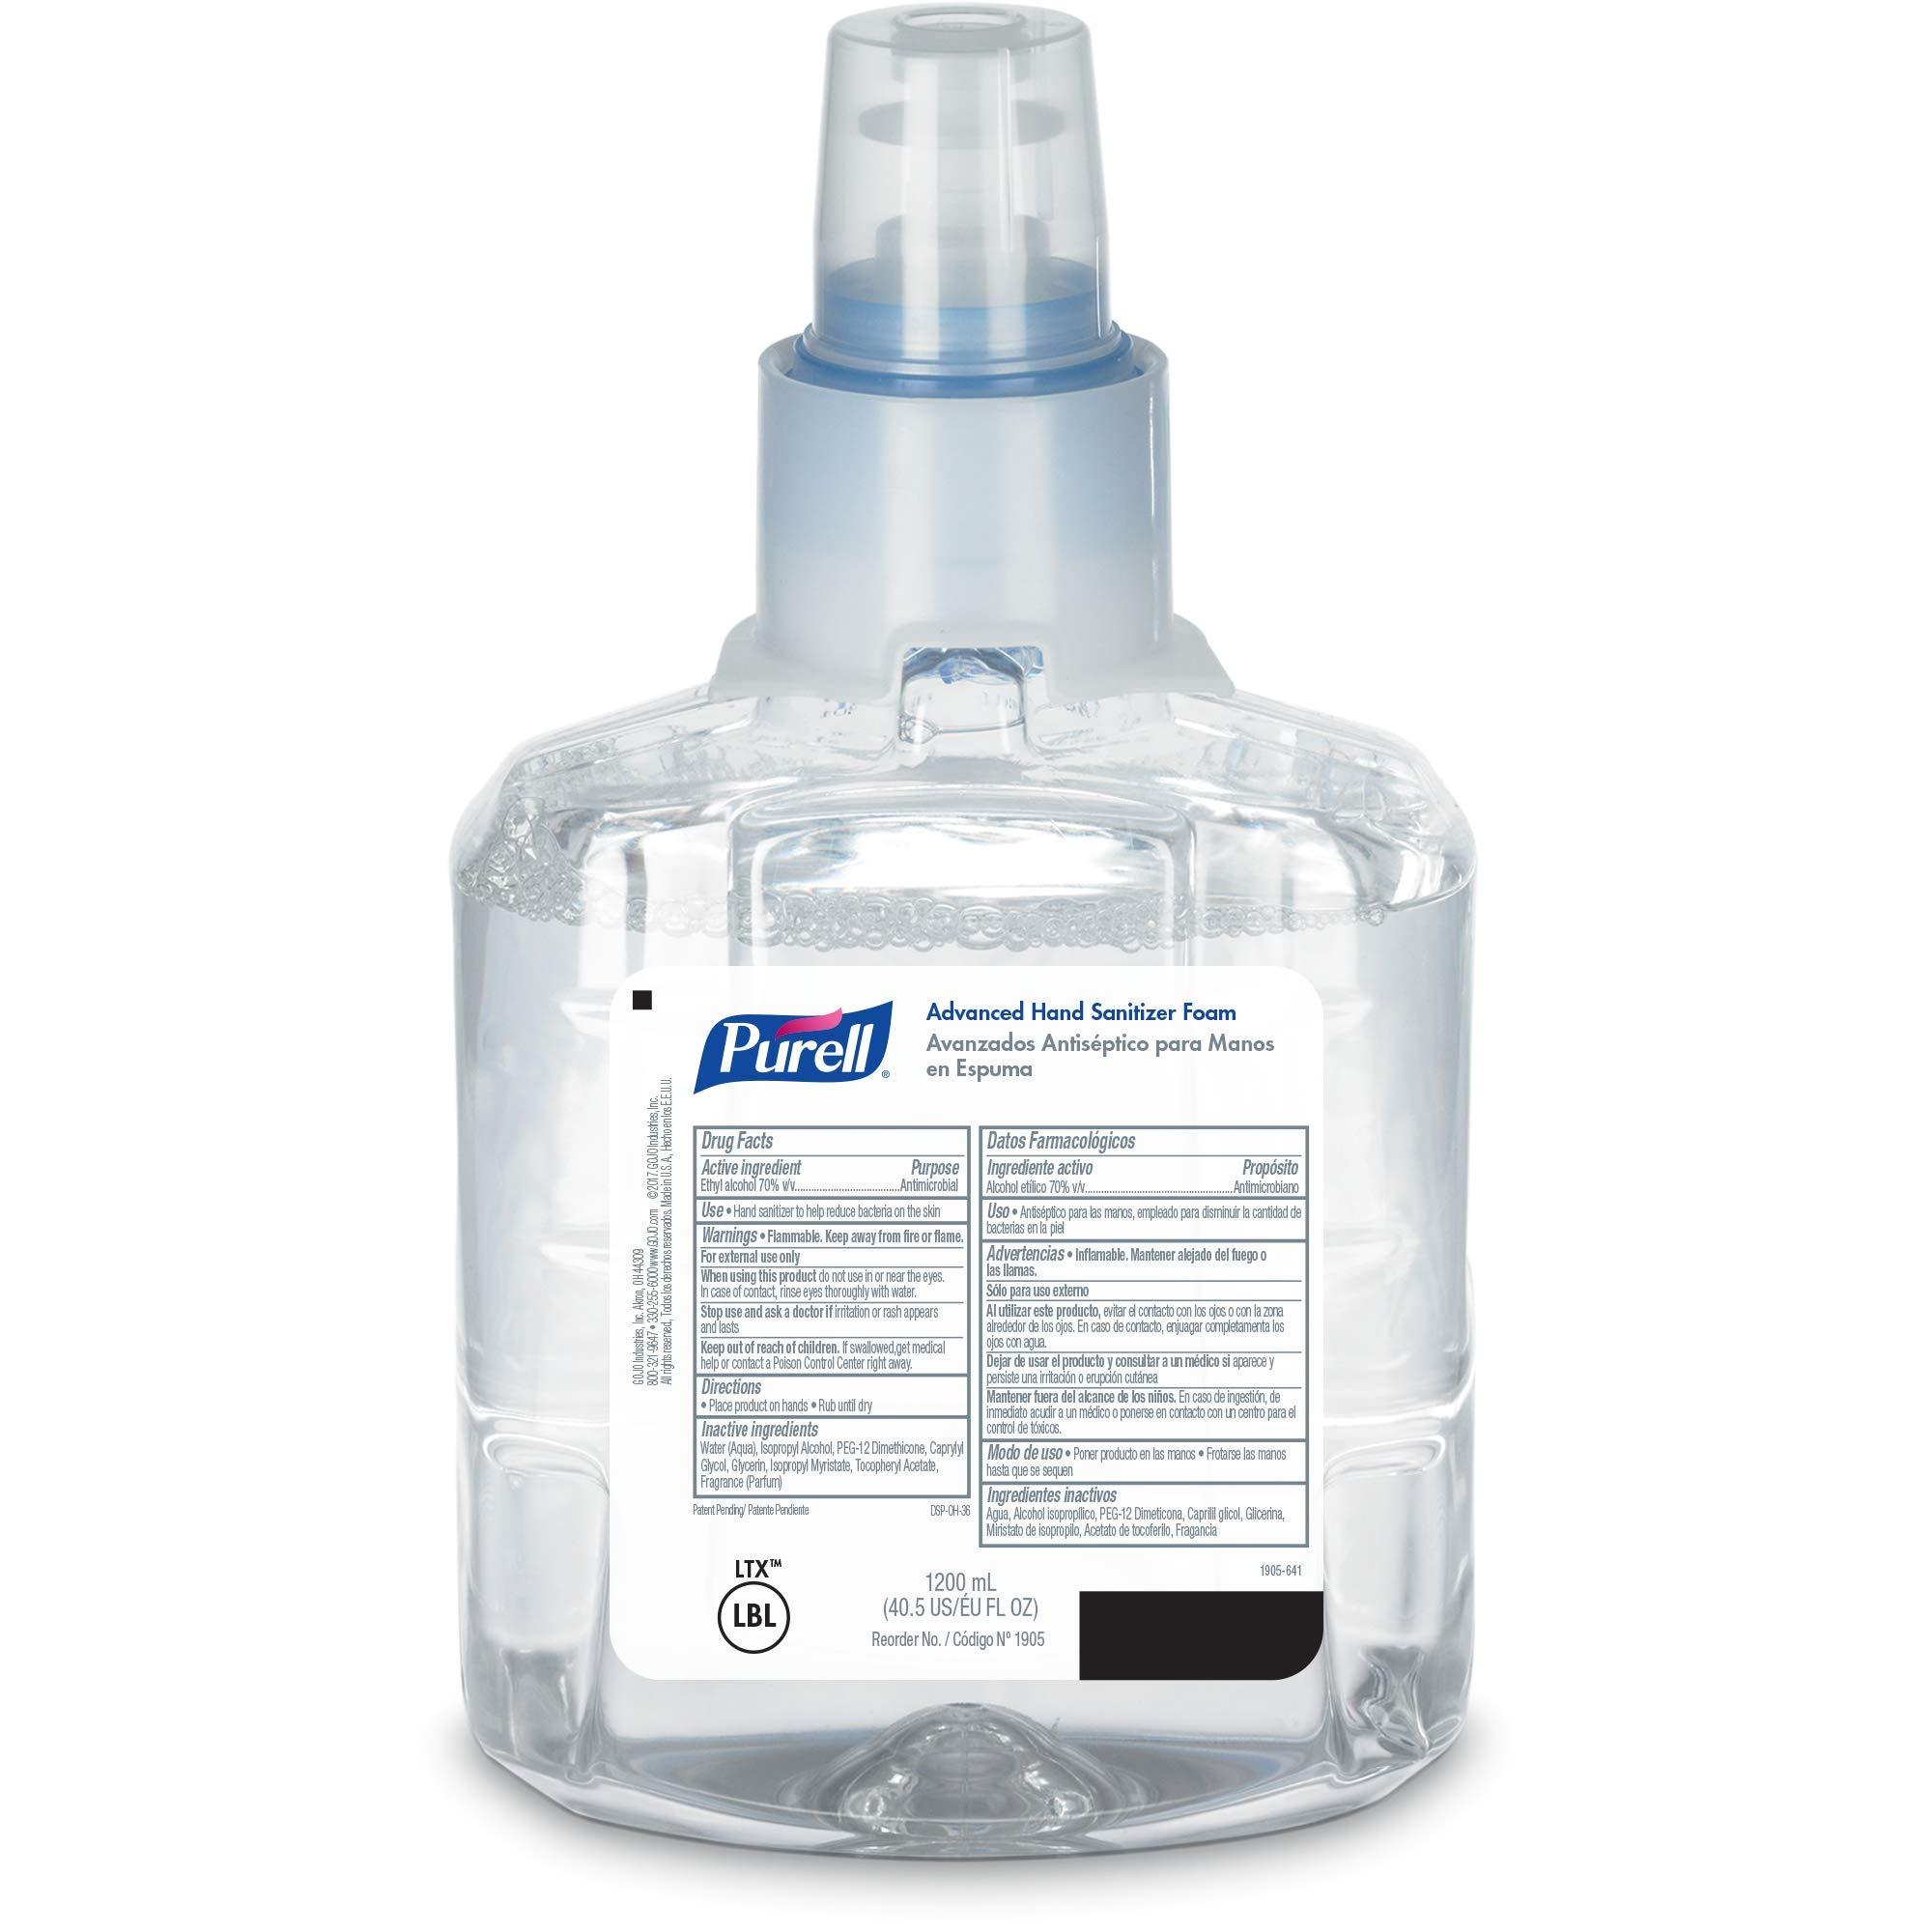 PURELL Advanced Hand Sanitizer Foam LTX-12 Starter Kit, 2 - 1200 mL Hand Sanitizer Foam Refills + 1- PURELL LTX-12 Chrome Finish Black Touch-Free Dispenser – 1905-D1